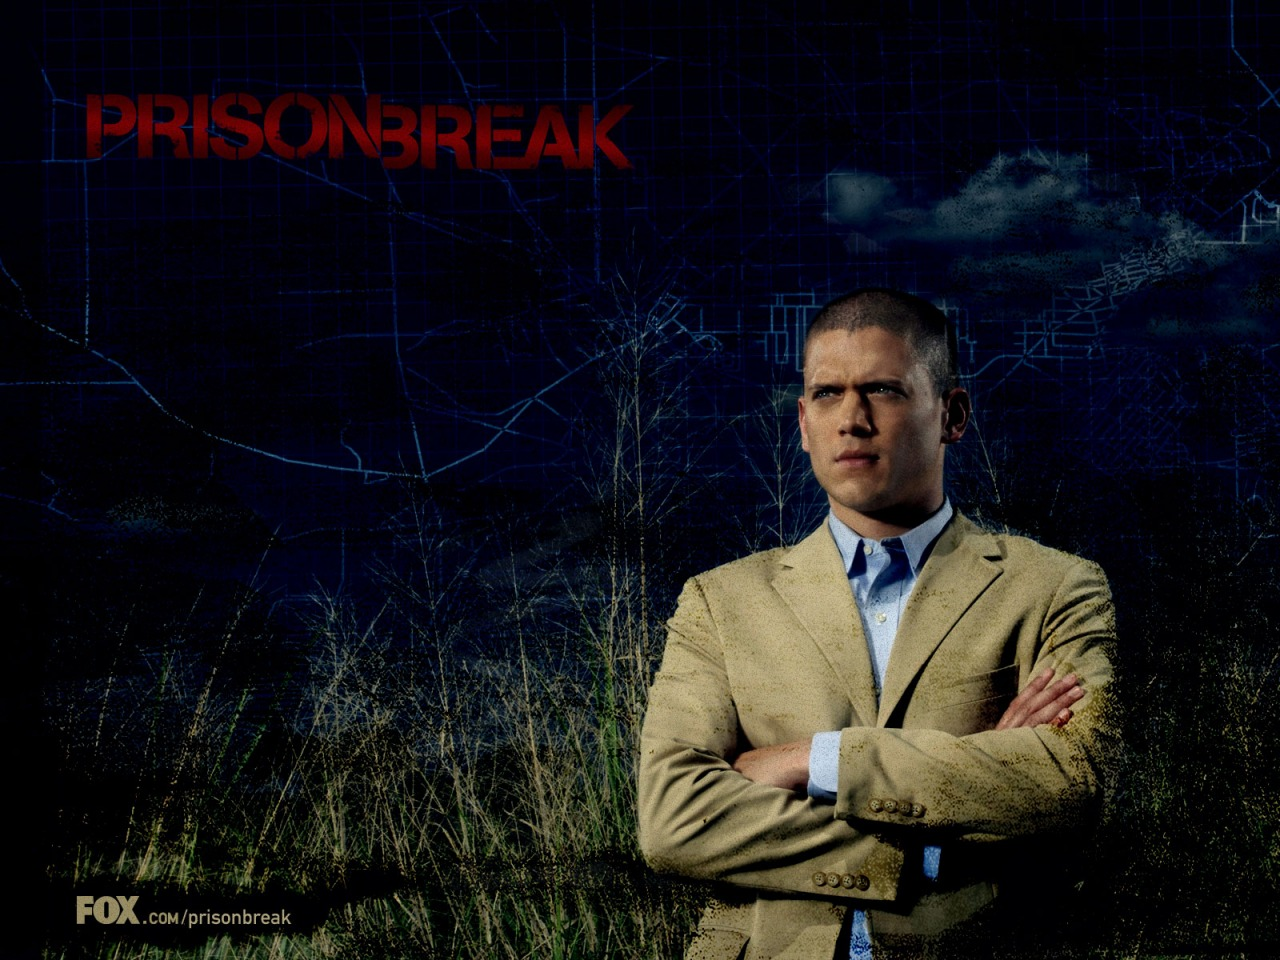 Free flash hero prison break: secret spy in jail apk download for.